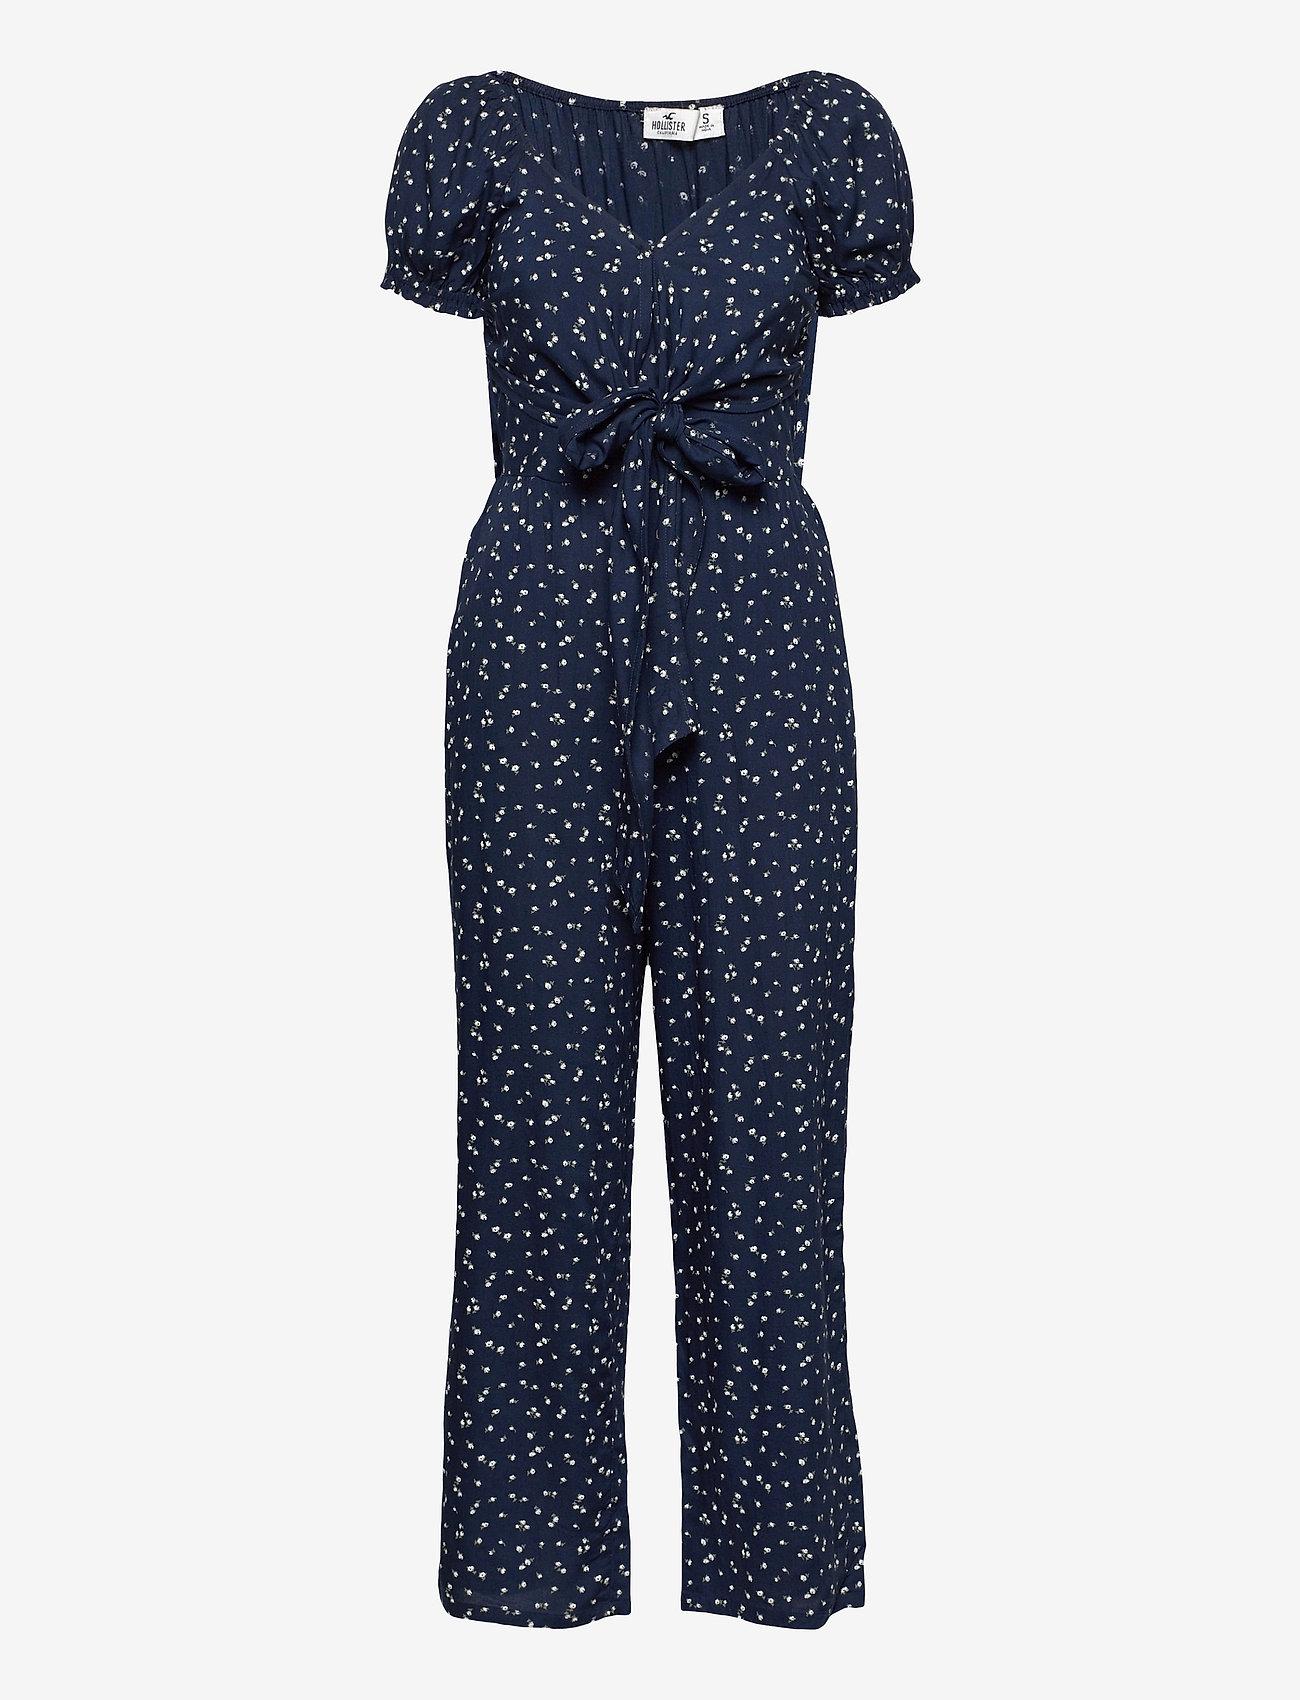 Hollister - HCo. GIRLS DRESSES - jumpsuits - navy floral - 0